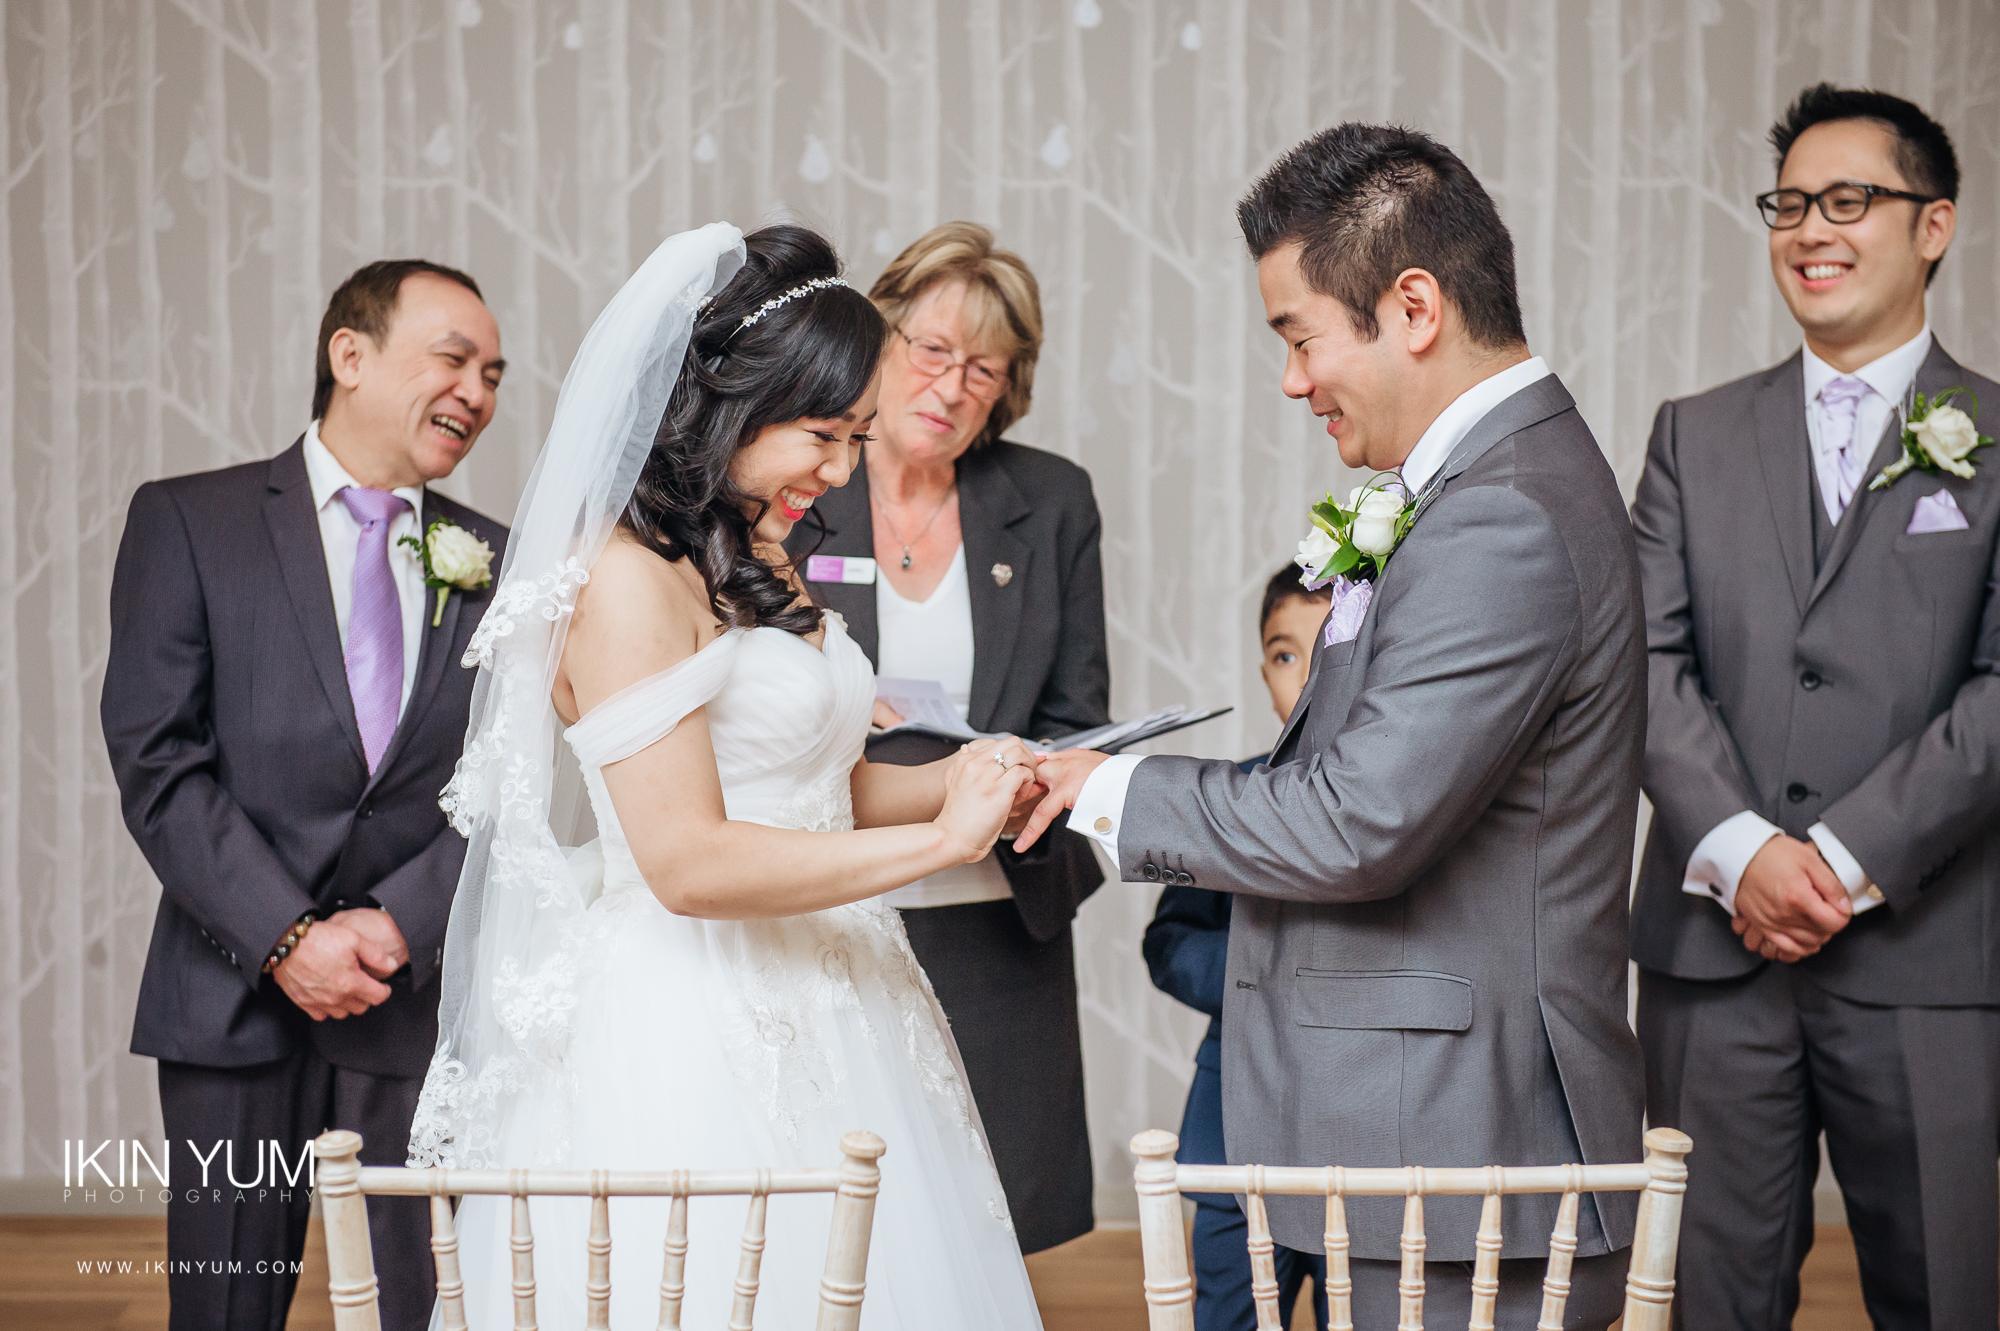 Hampton Manor Wedding - Ikin Yum Photography -082.jpg